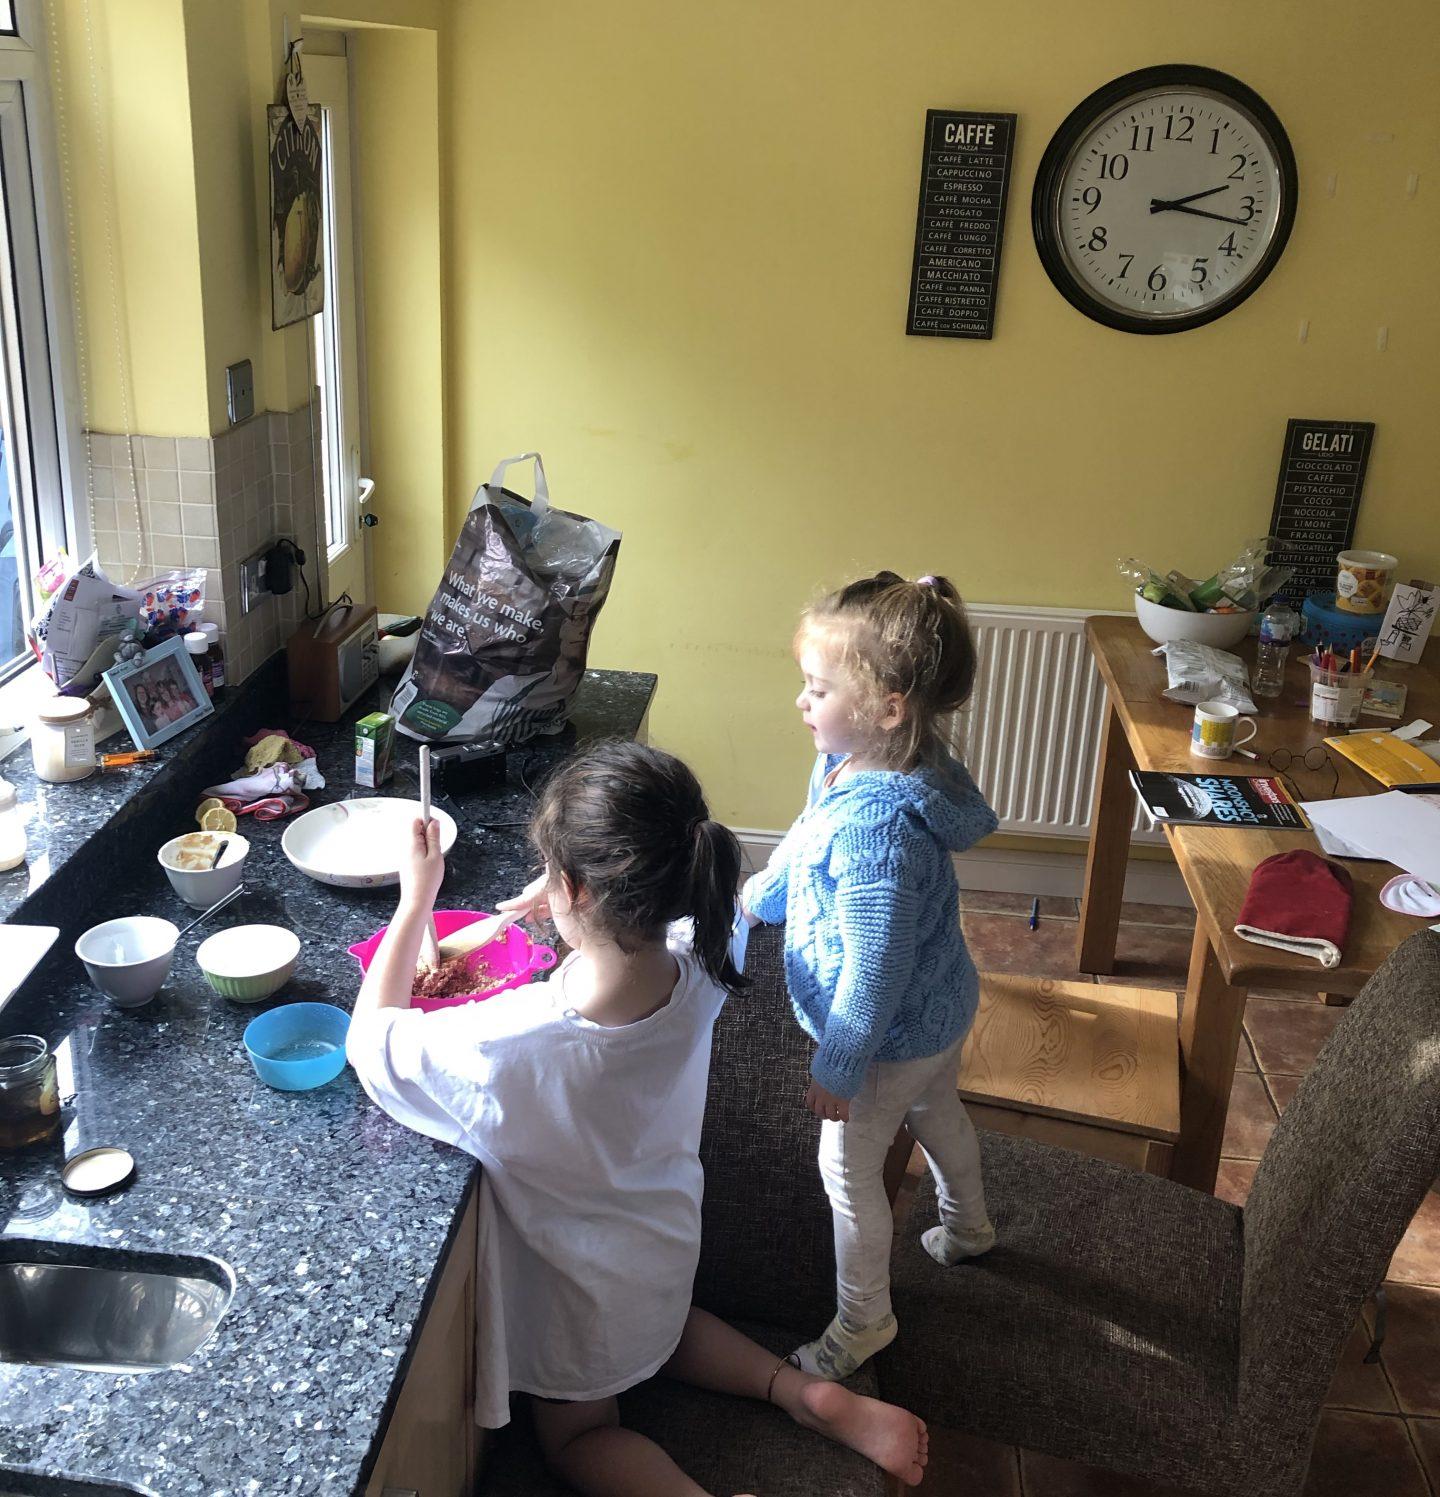 kids baking in a messy kitchen